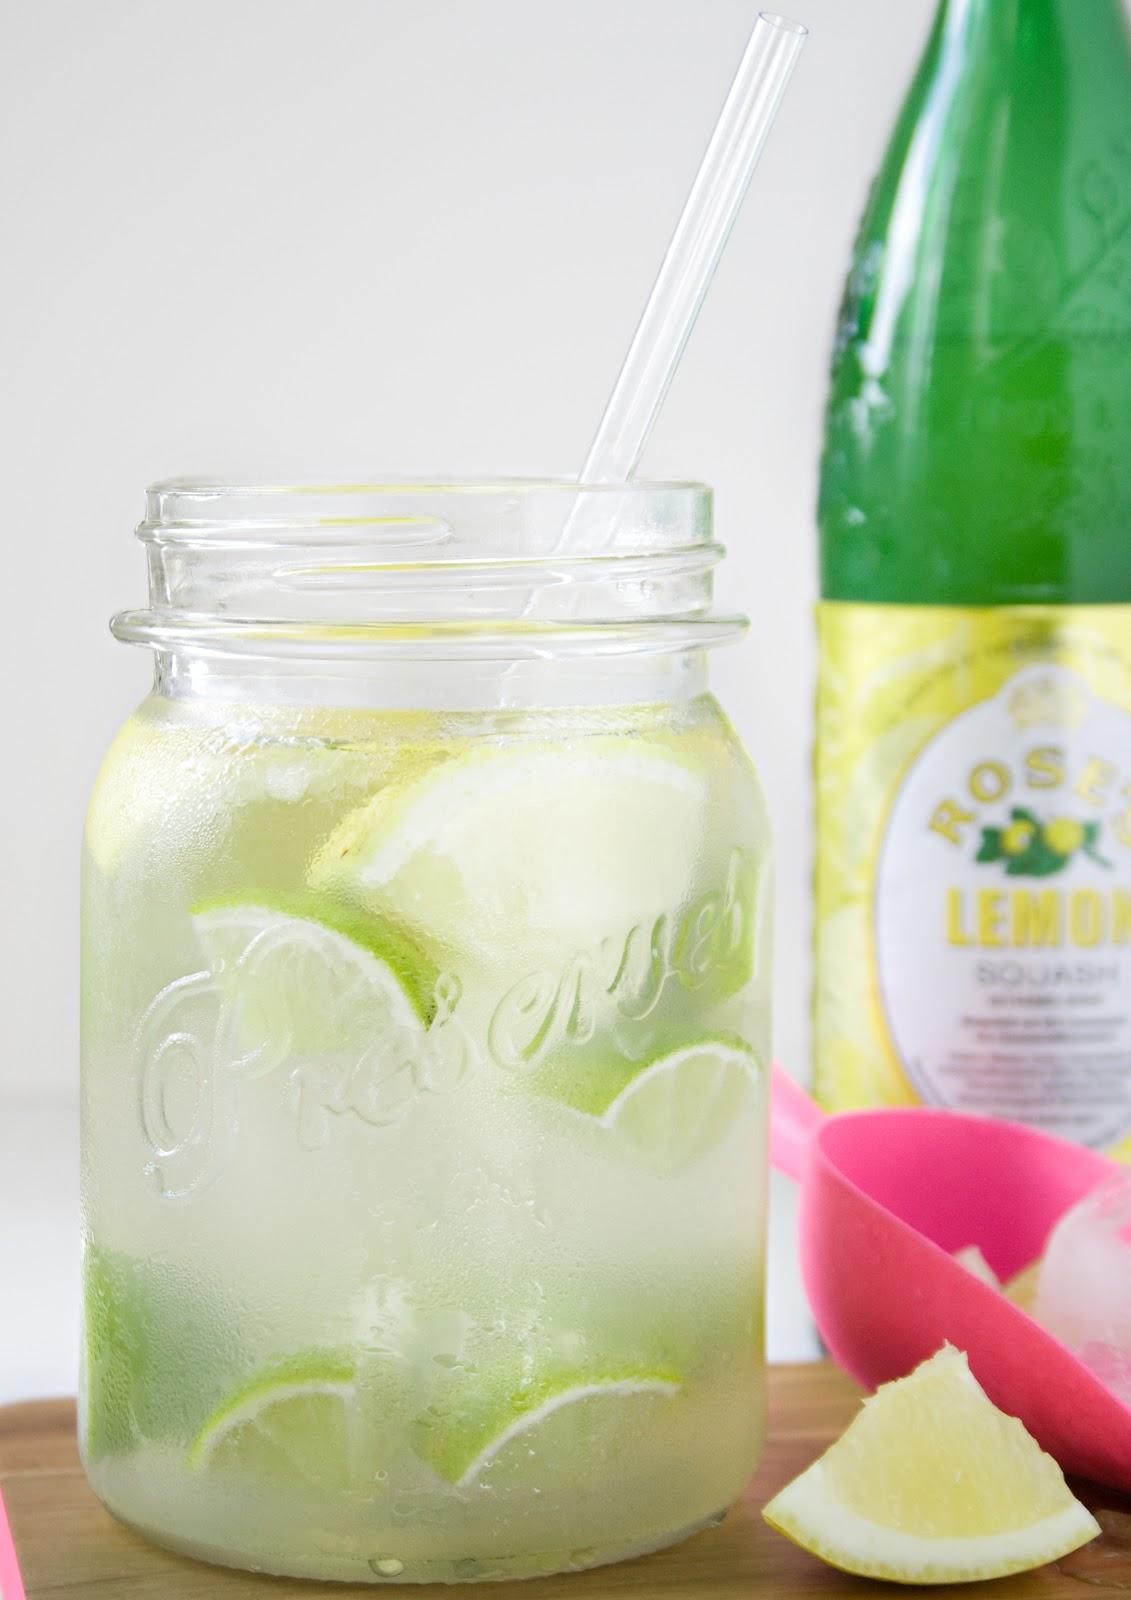 Lemonsirup von Rose's